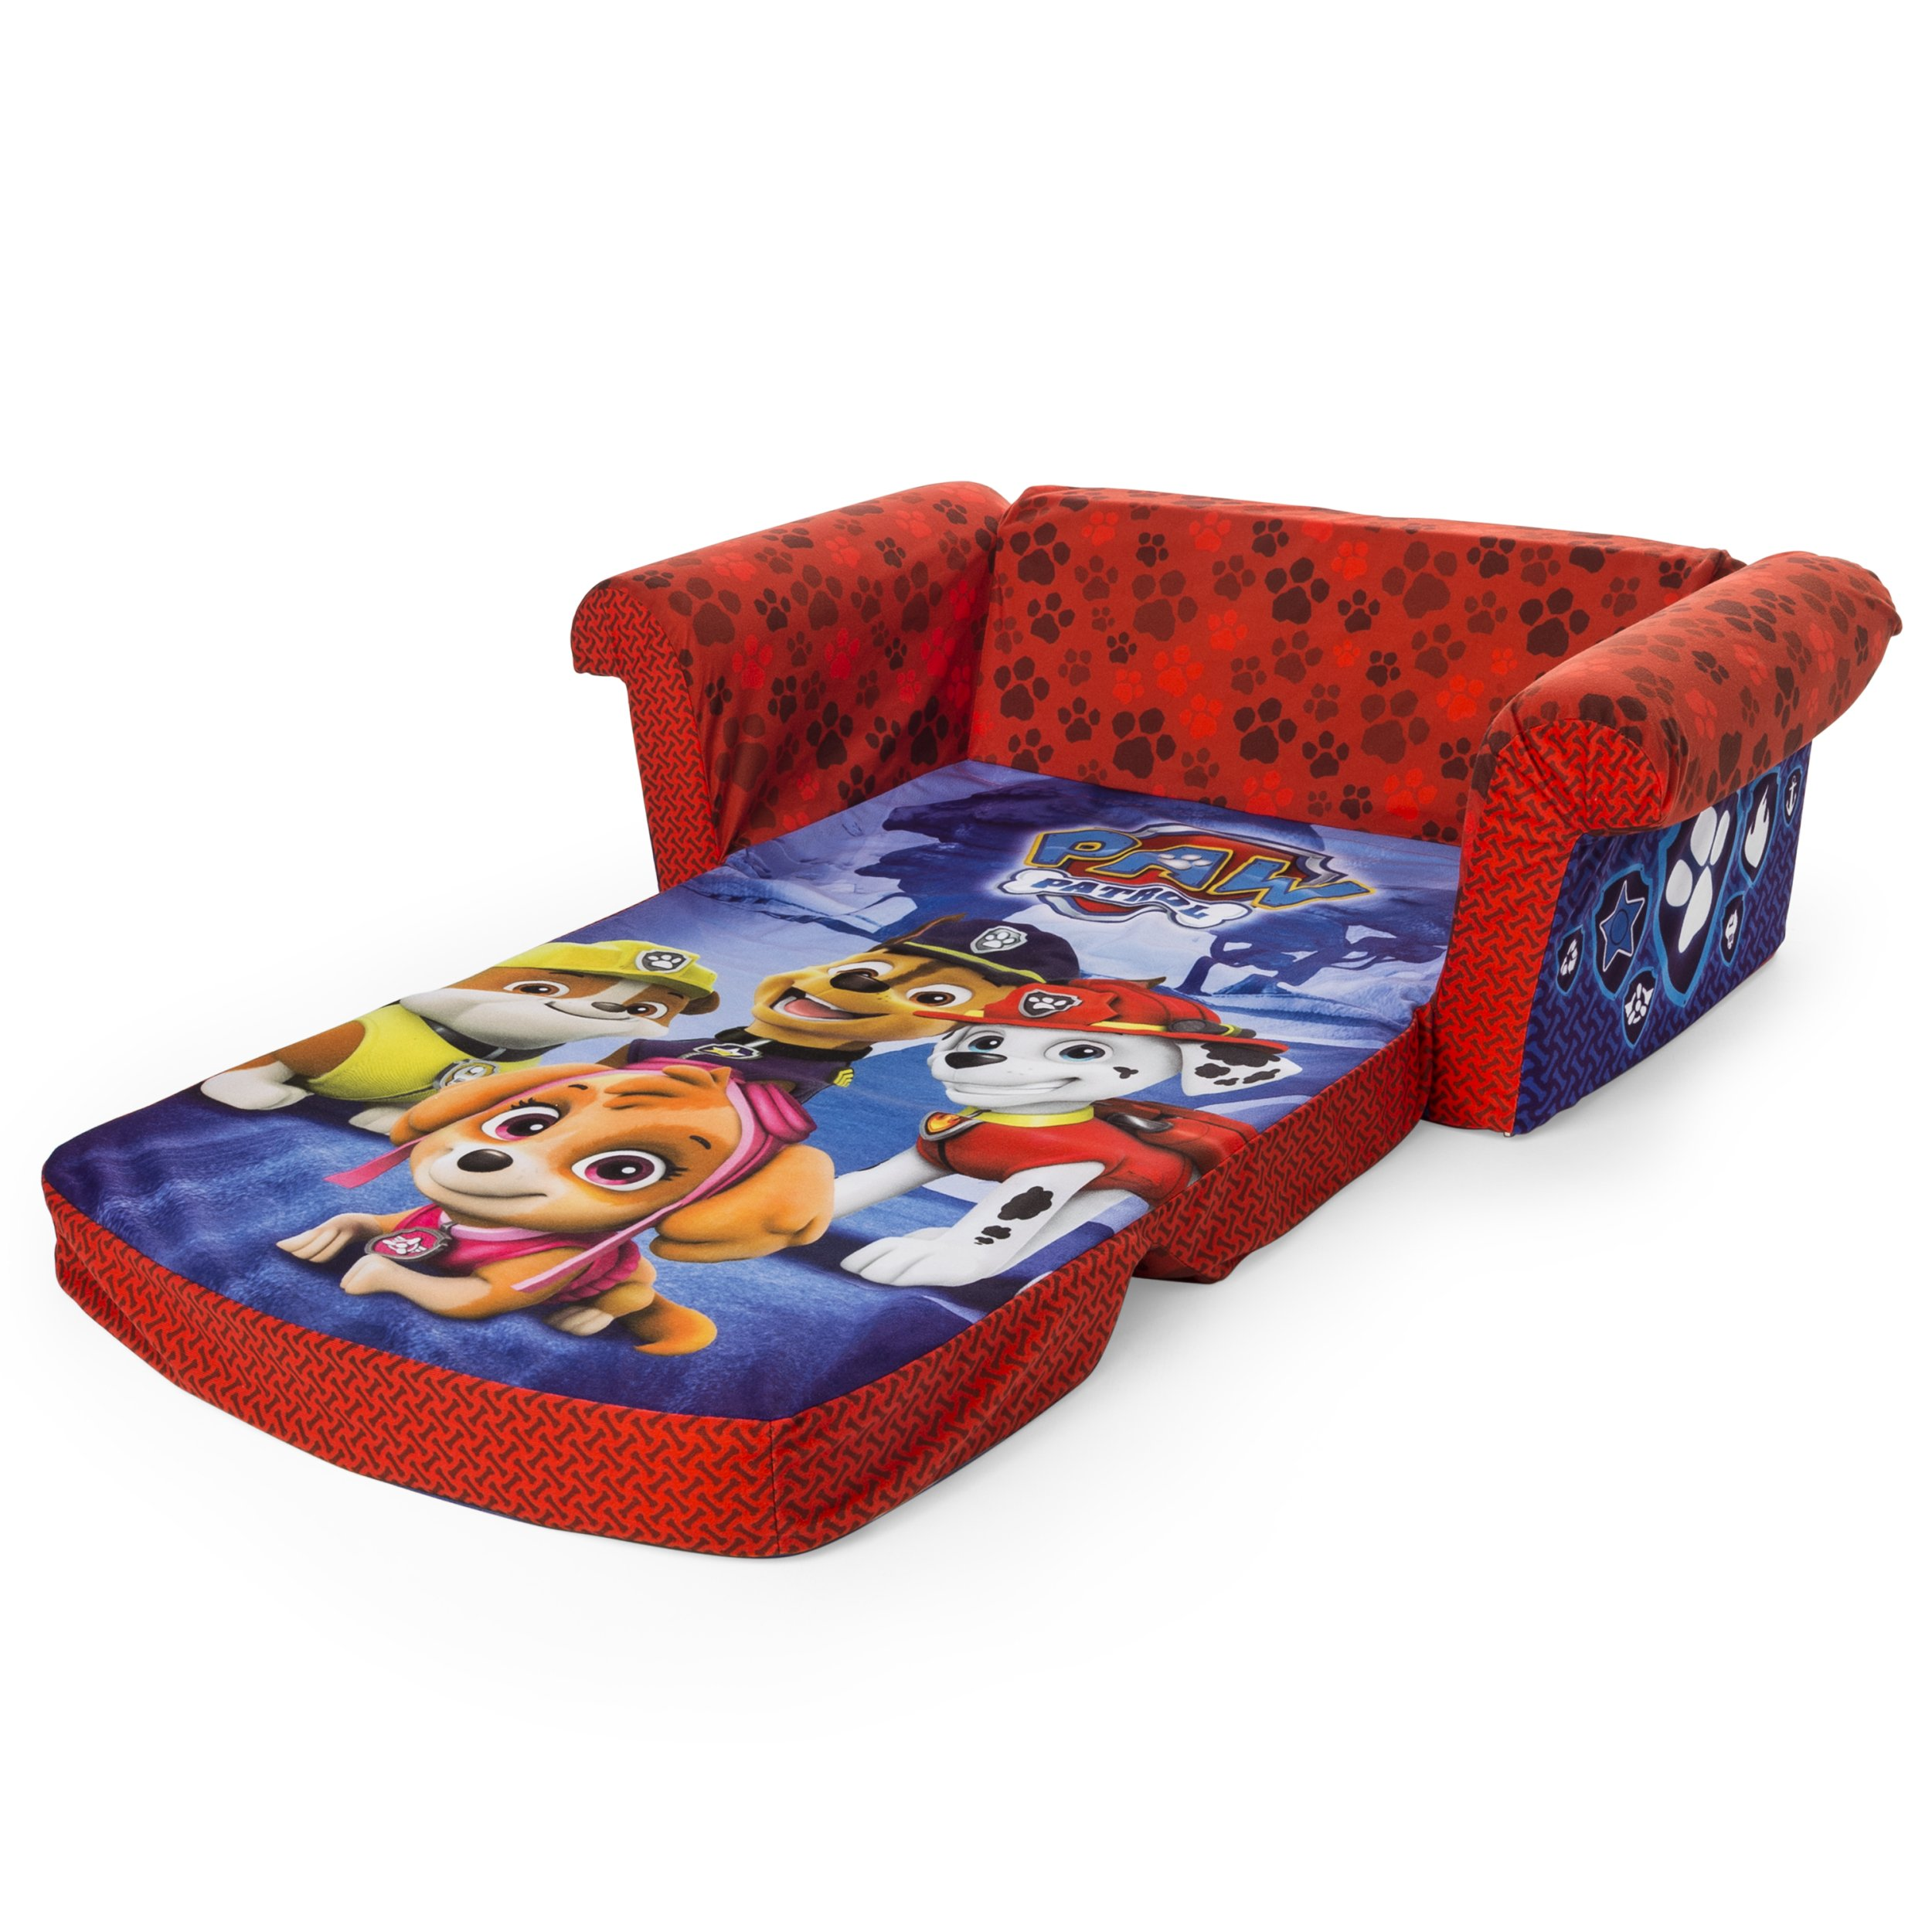 Marshmallow Furniture Children's 2 in 1 Flip Open Foam, Nickelodeon Paw Patrol Sofa Chair Furniture, Red by Marshmallow Furniture (Image #5)